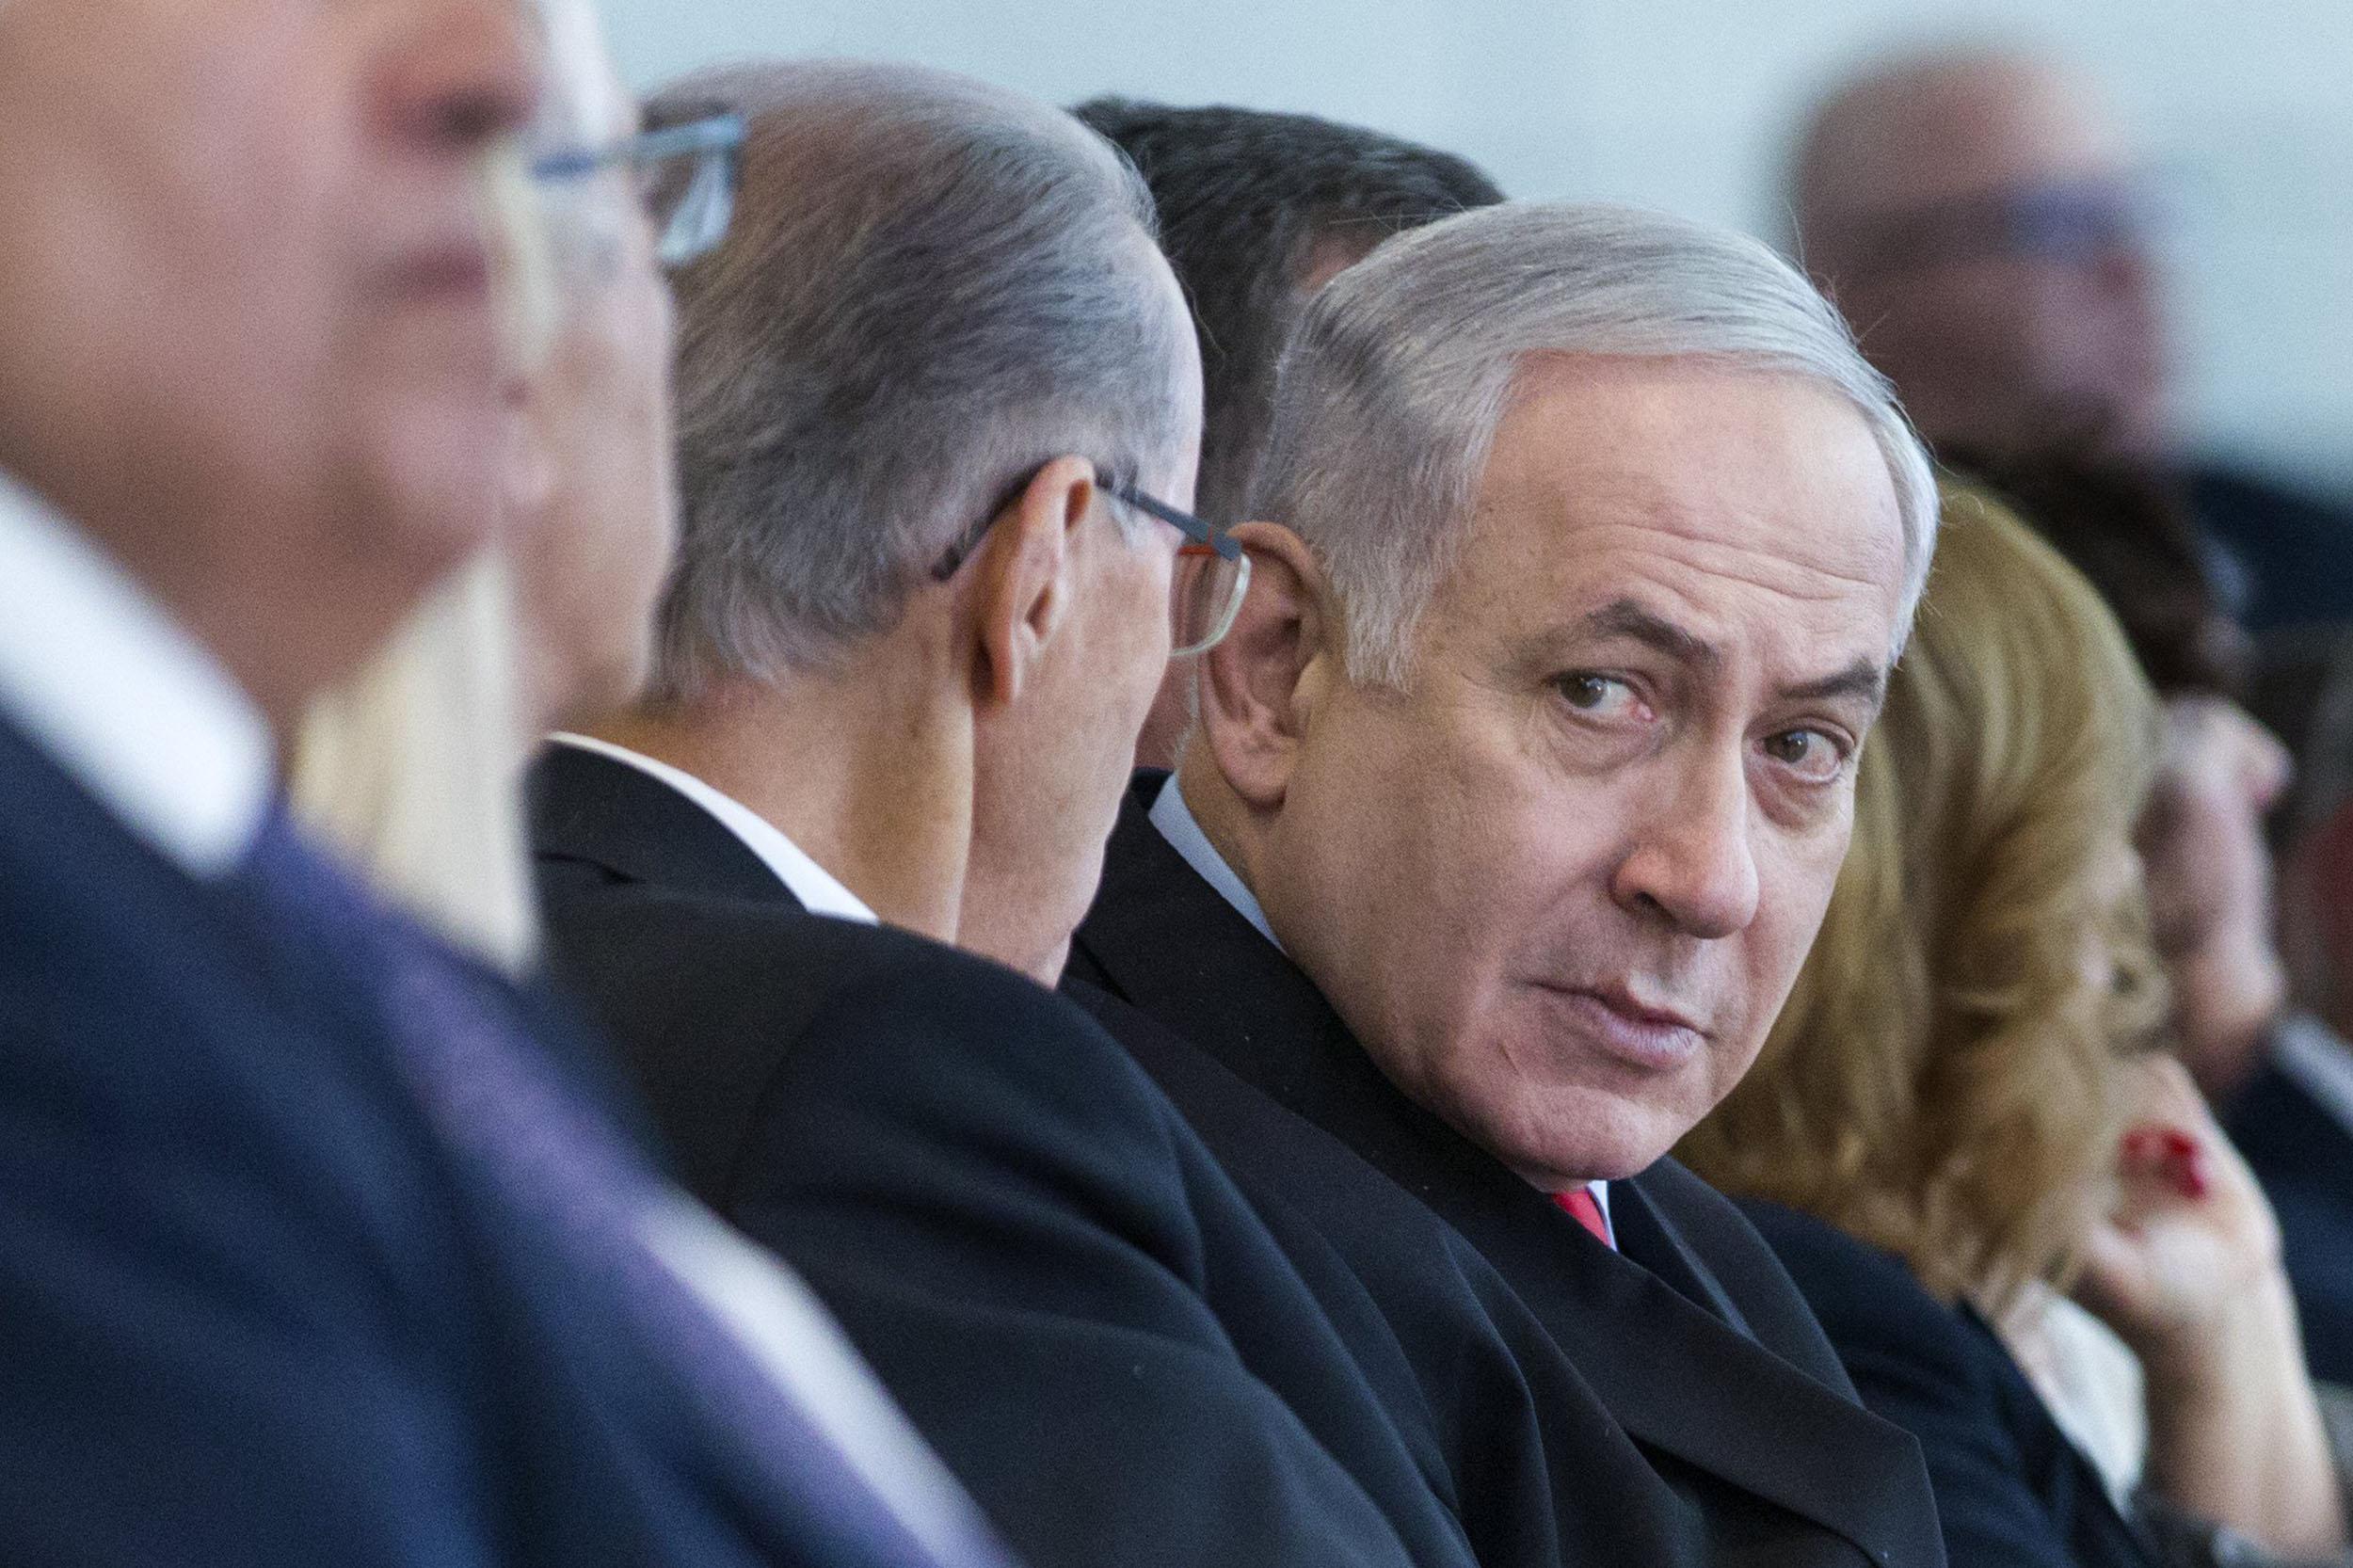 Image result for images of benjamin netanyahu and Nir Hefetz